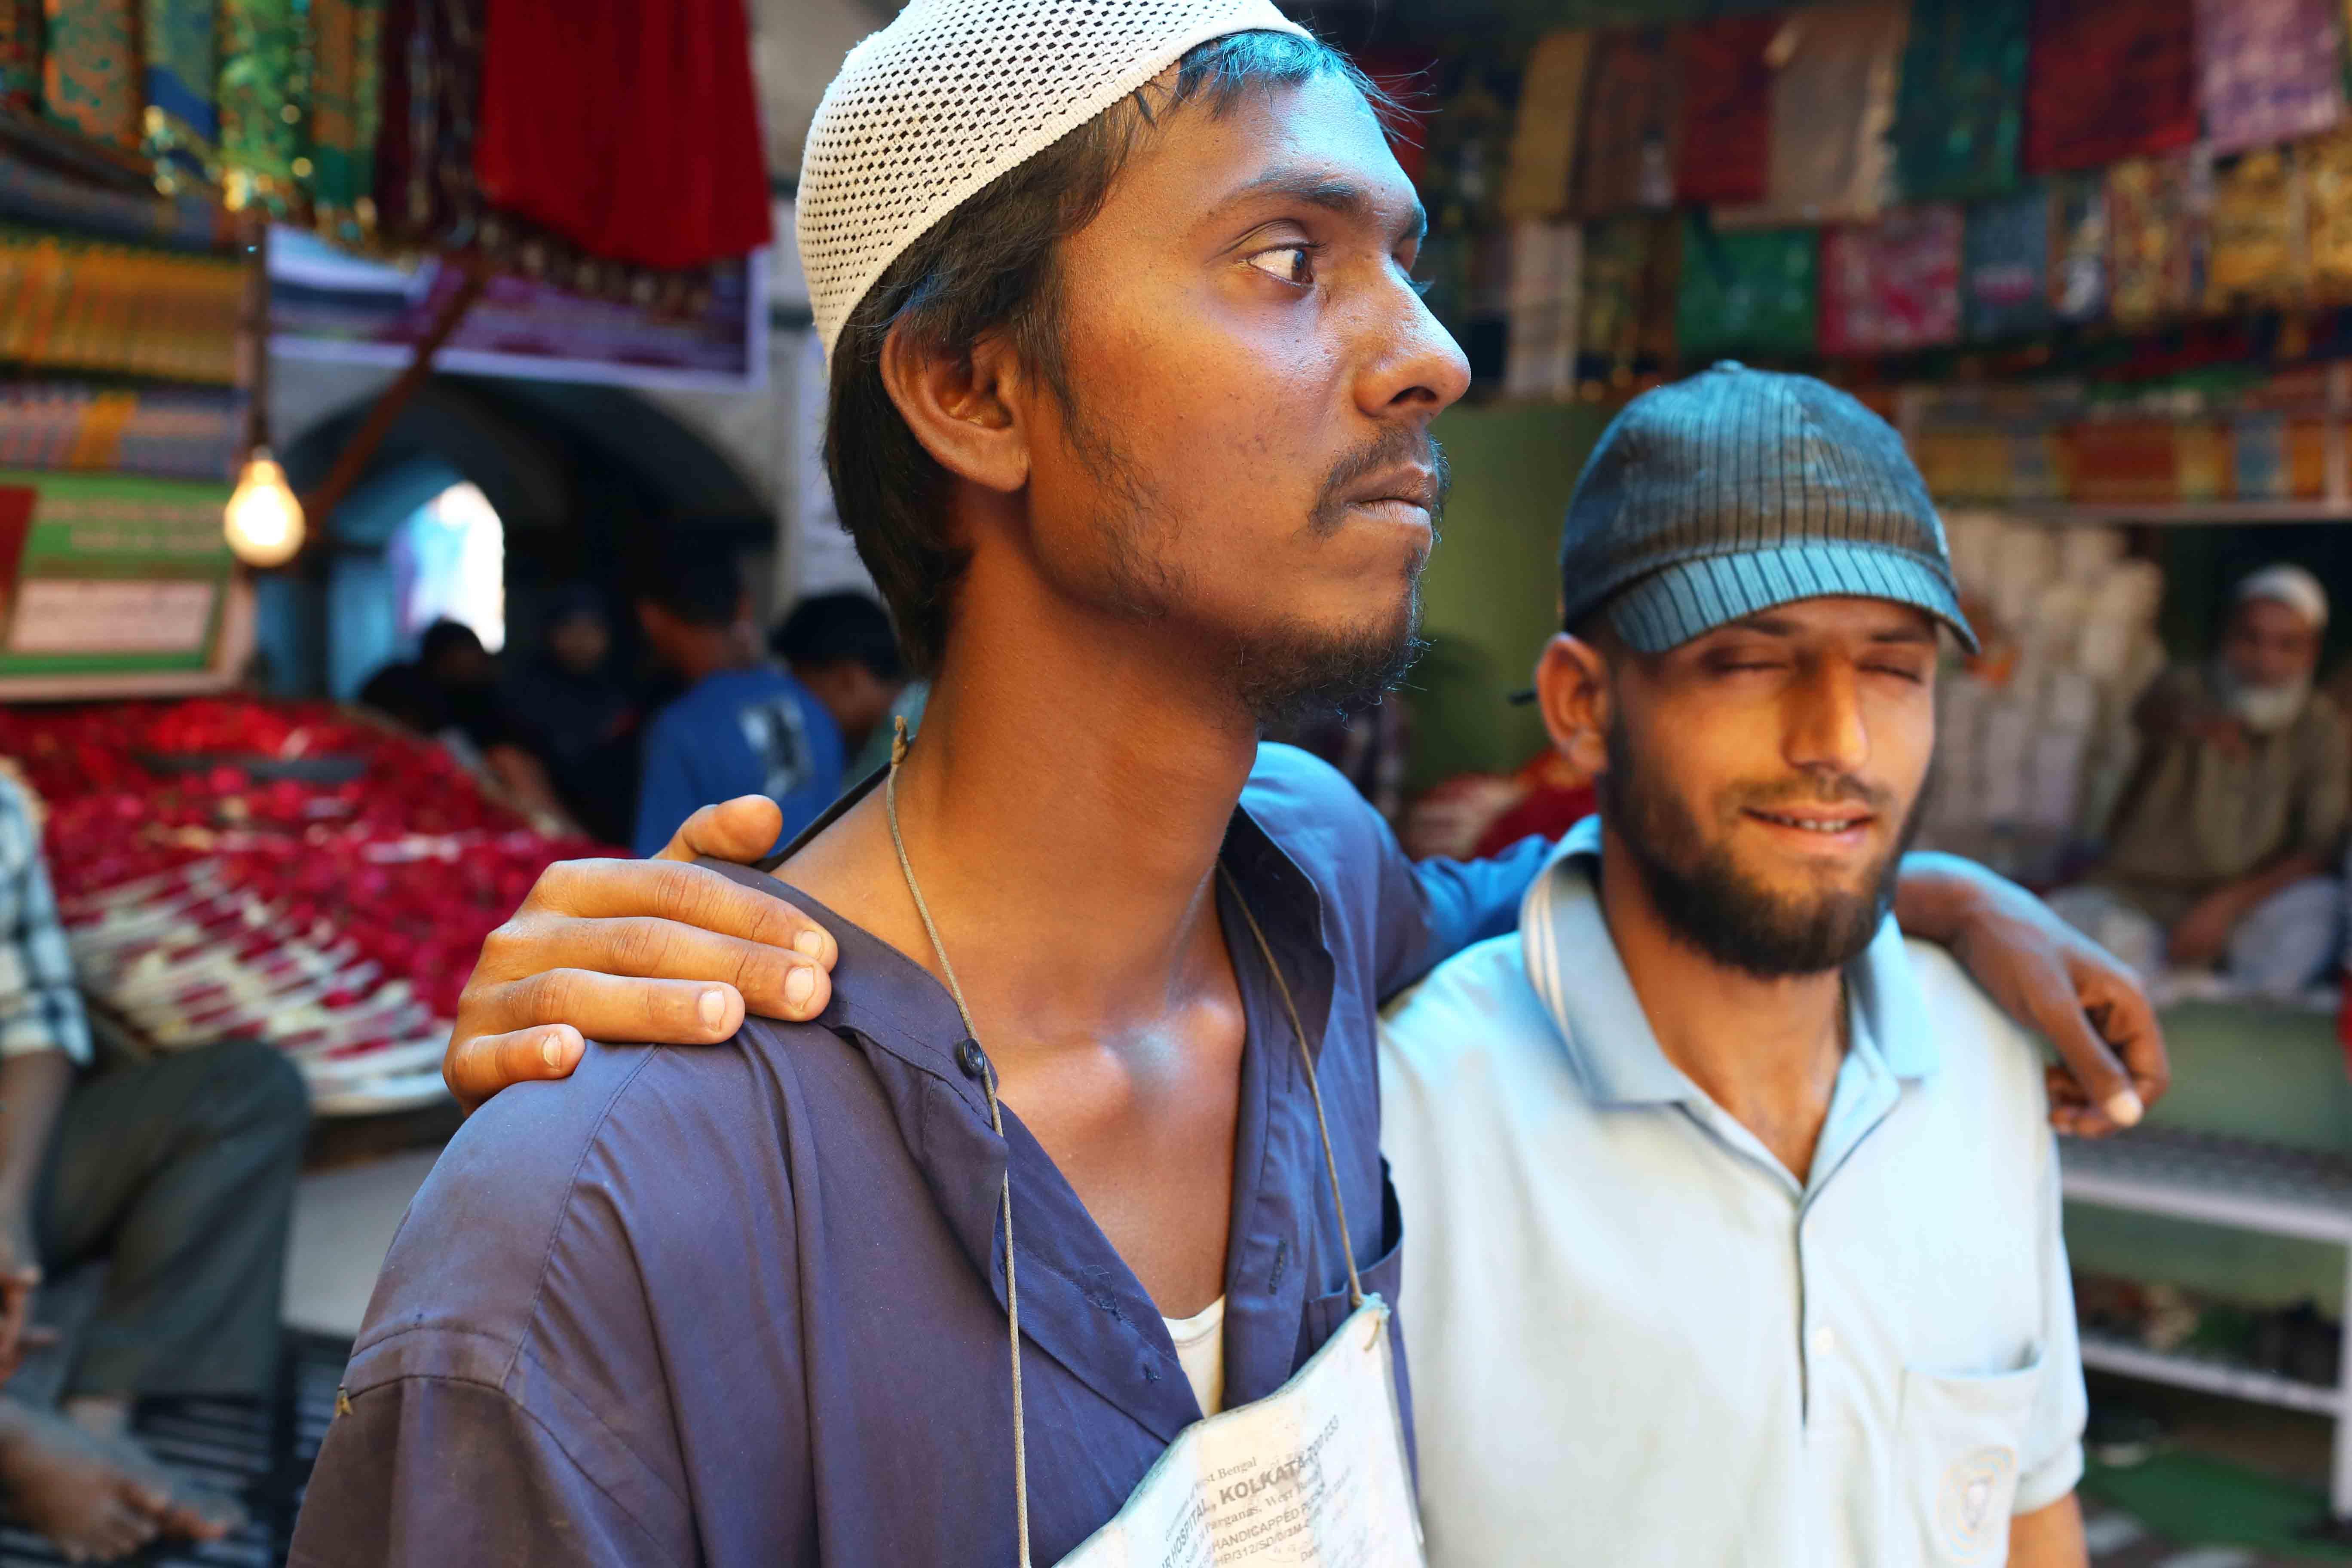 City Moment – Two Friends Walking Together, Hazrat Nizamuddin Basti